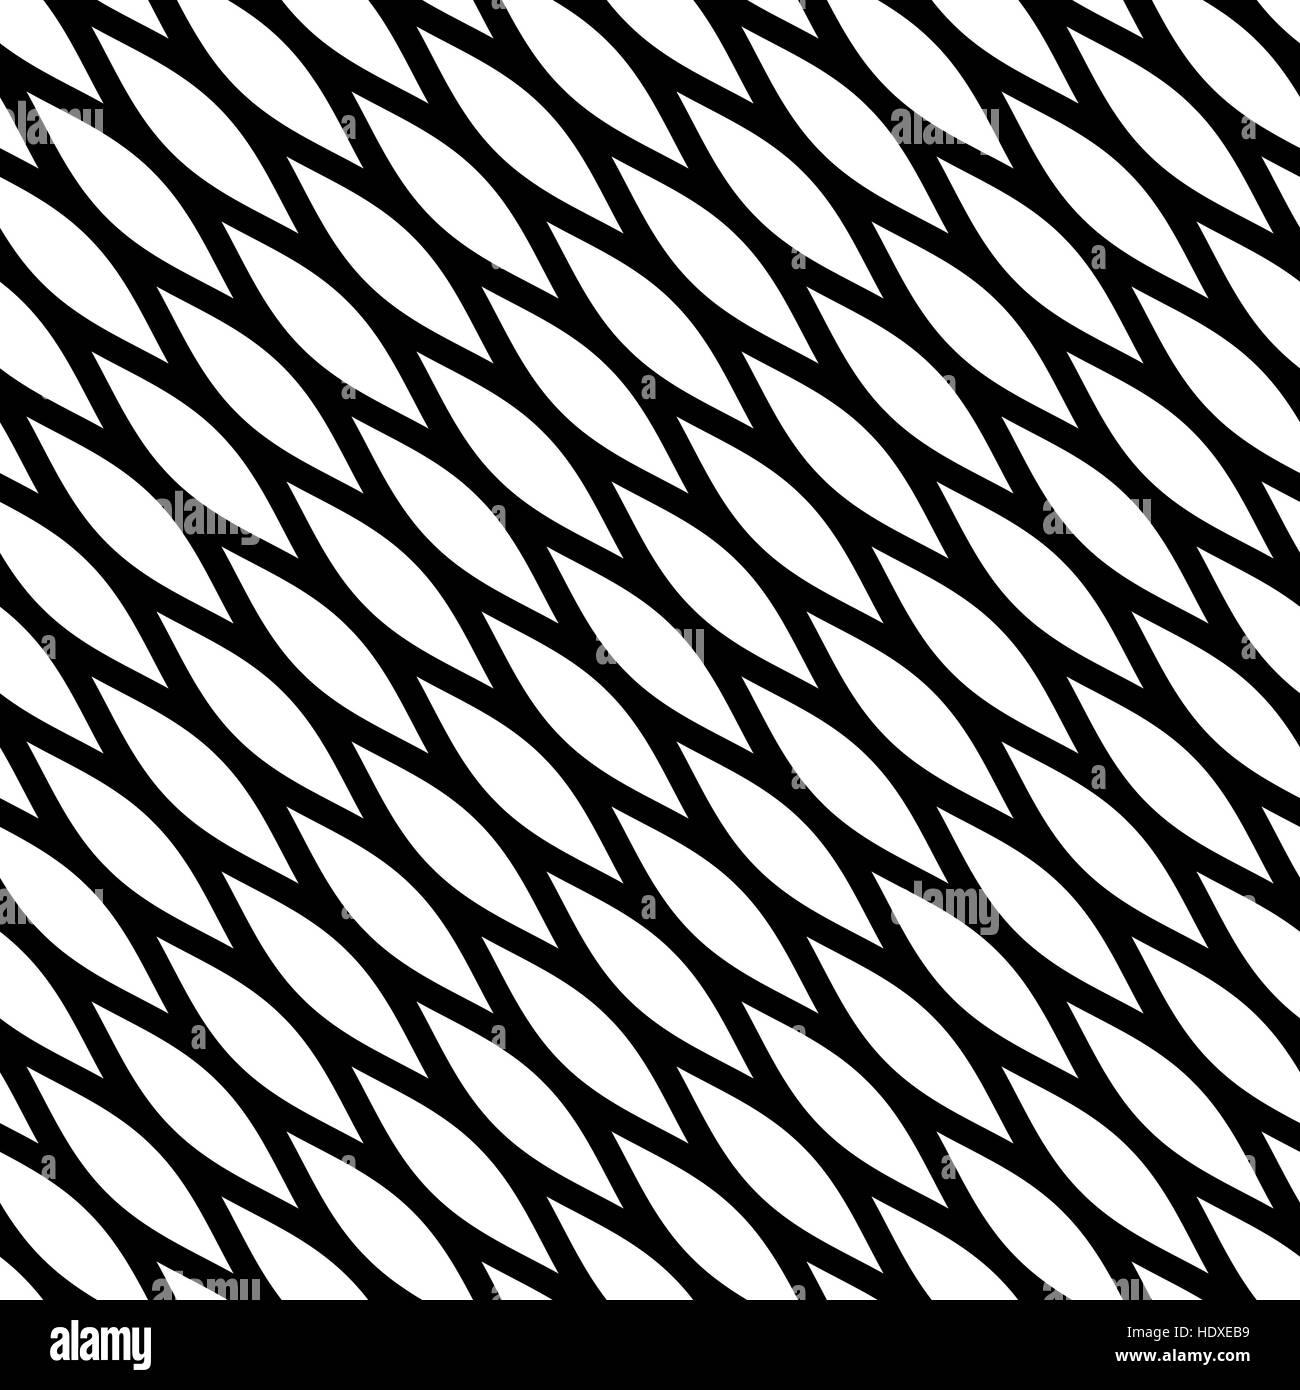 Seamless Abstract Pattern Photo Stock